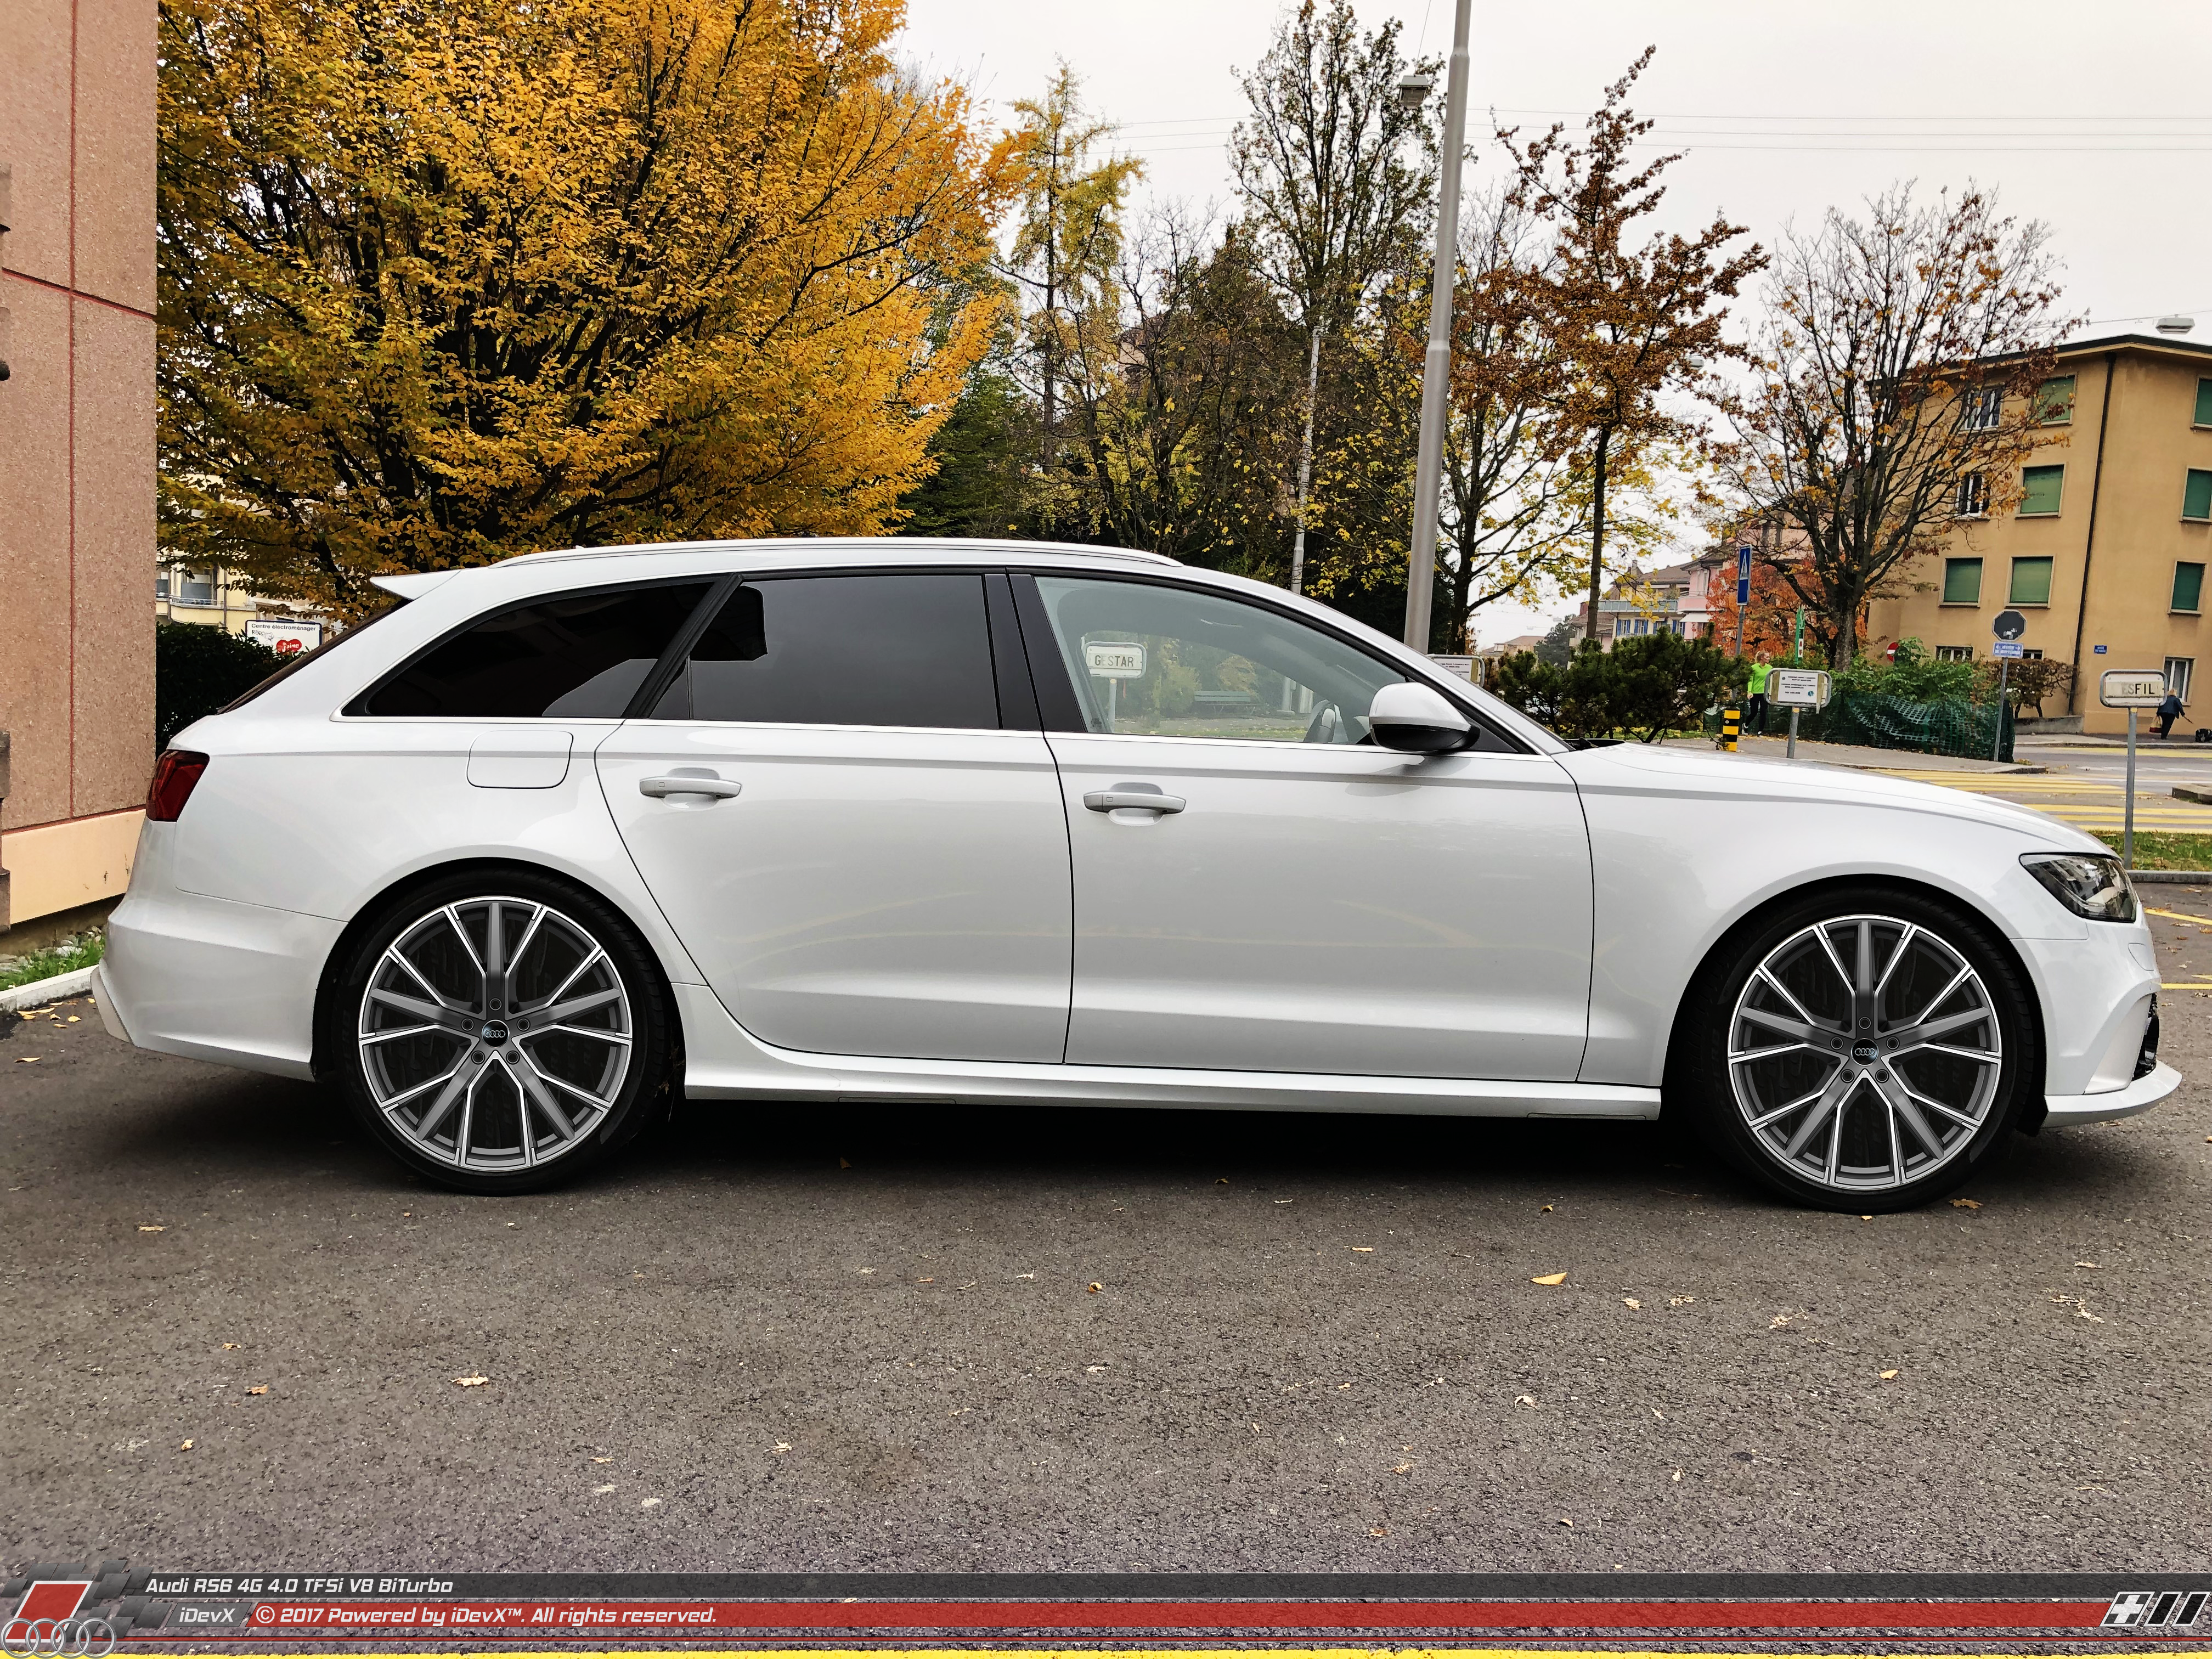 iDevX_Audi-RS6_Test-JantesPERF-22inch.png